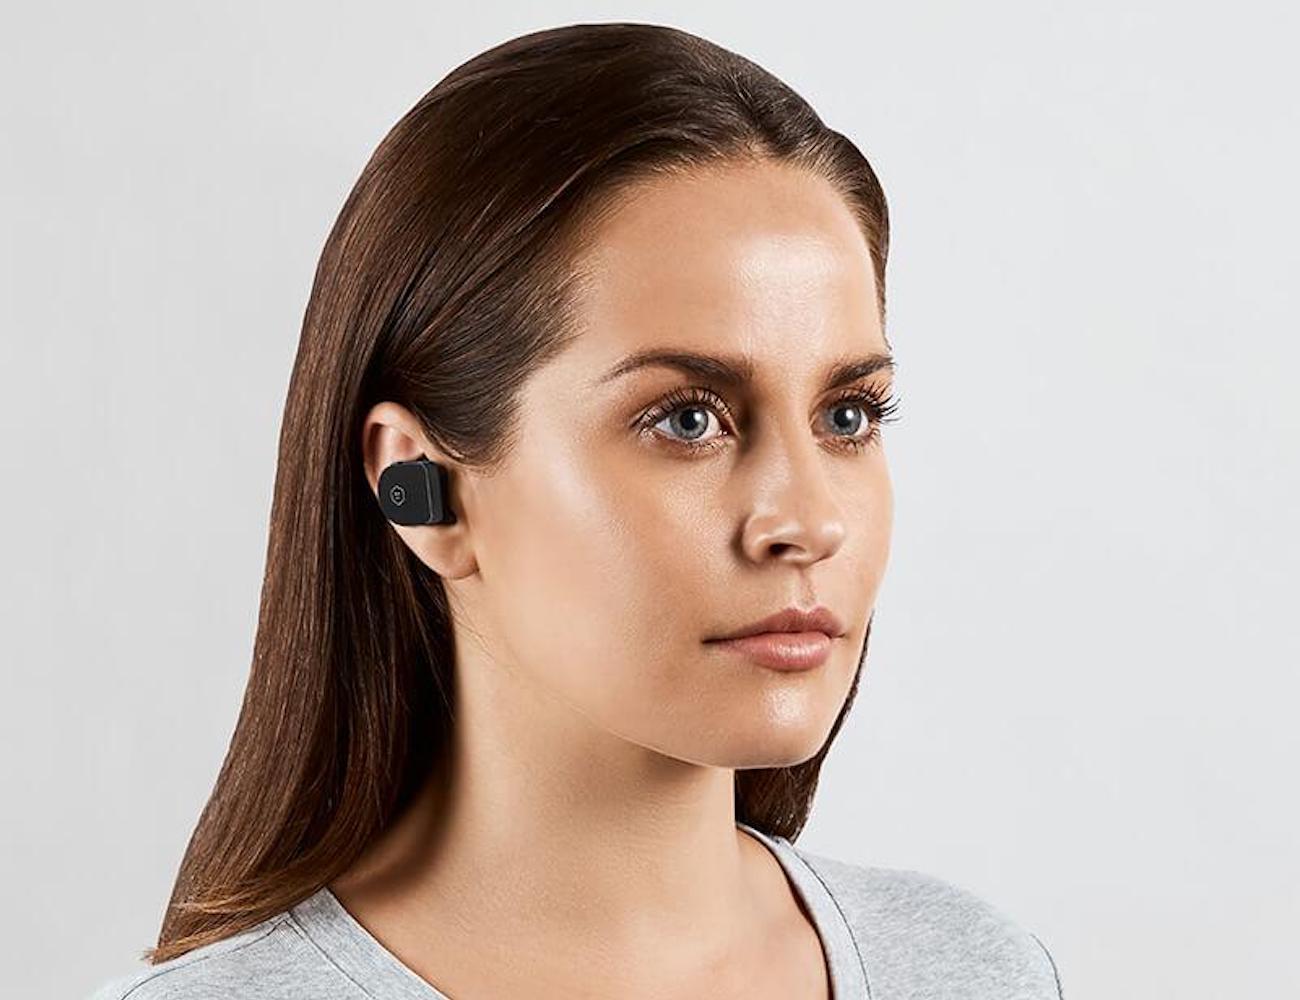 https://thegadgetflow.com/wp-content/uploads/2018/09/Master-and-Dynamic-MW07-True-Wireless-Earphones-01.jpg